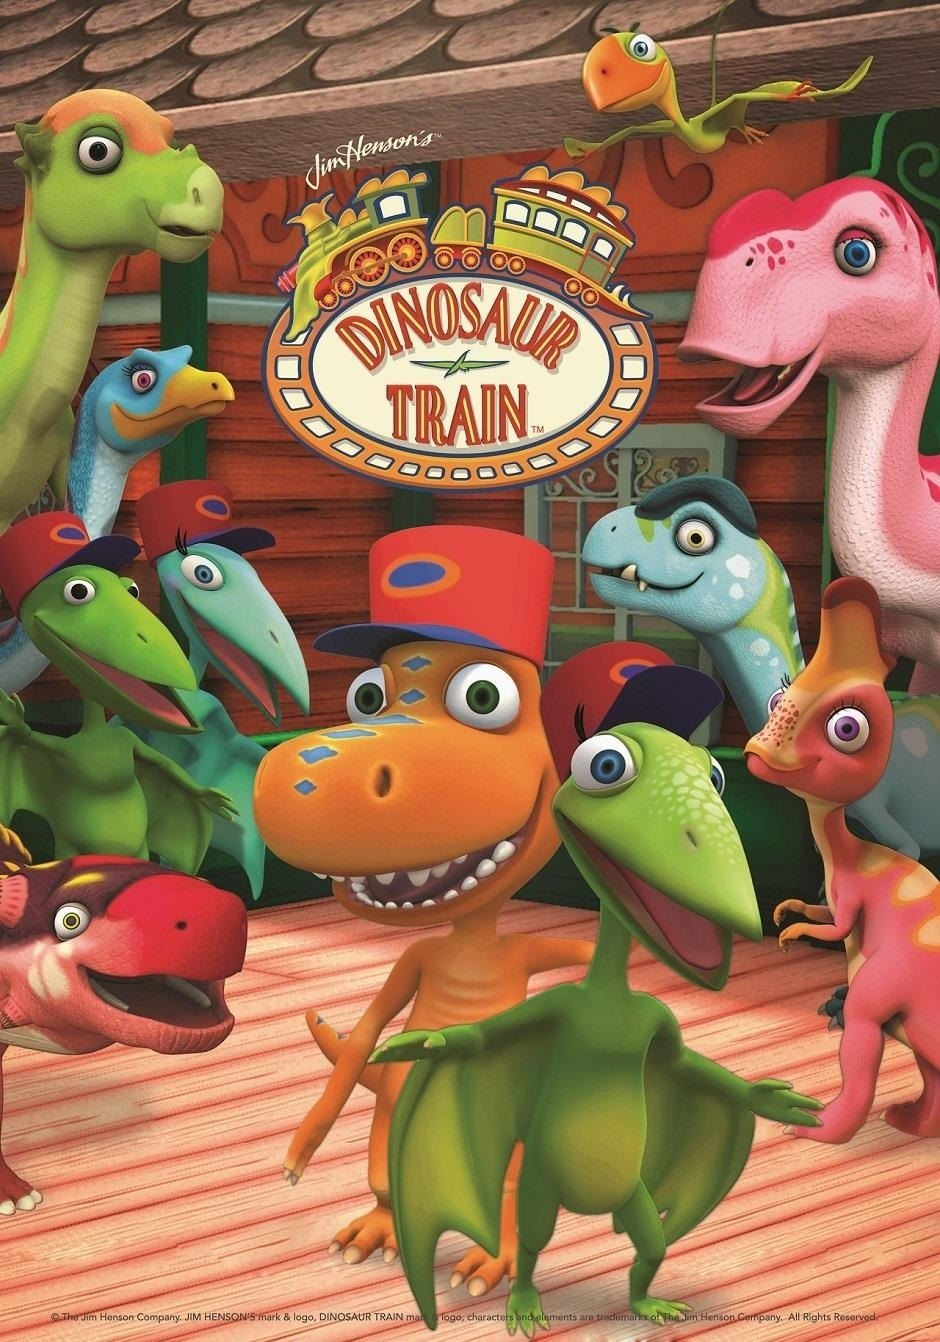 Henson, France Televisions Teaming on New \'Dinosaur Train\' Shorts ...